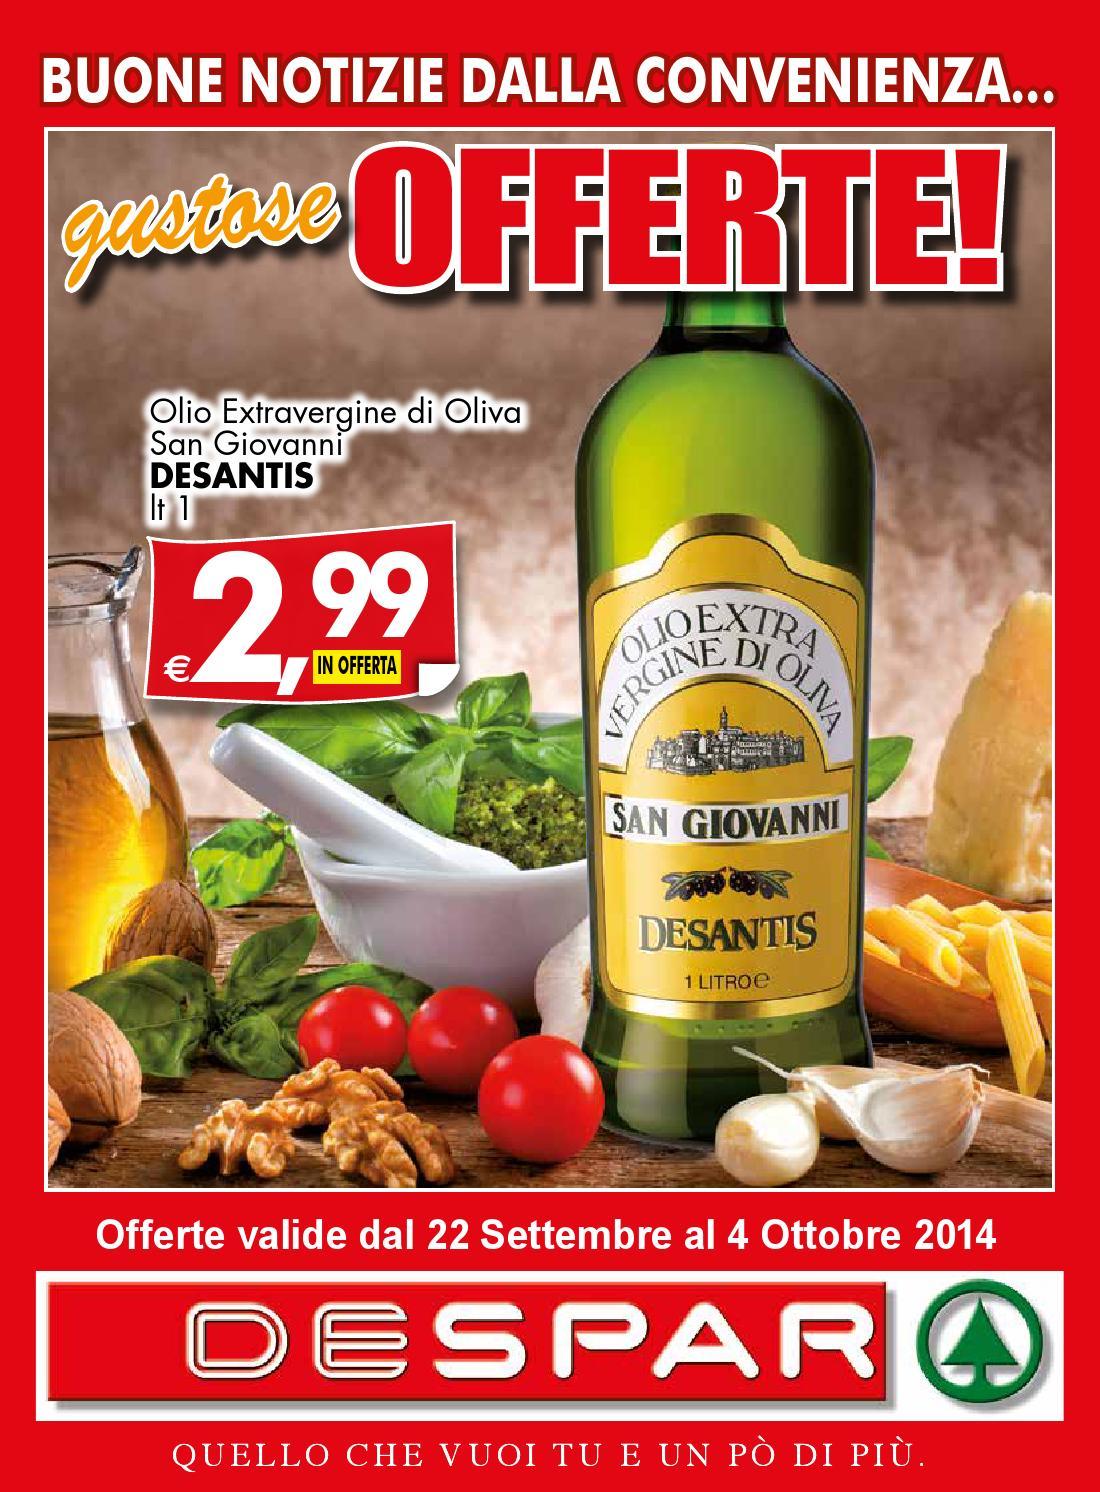 Volantino despar affiliati 22 settembre 4 ottobre 2014 for Volantino despar messina